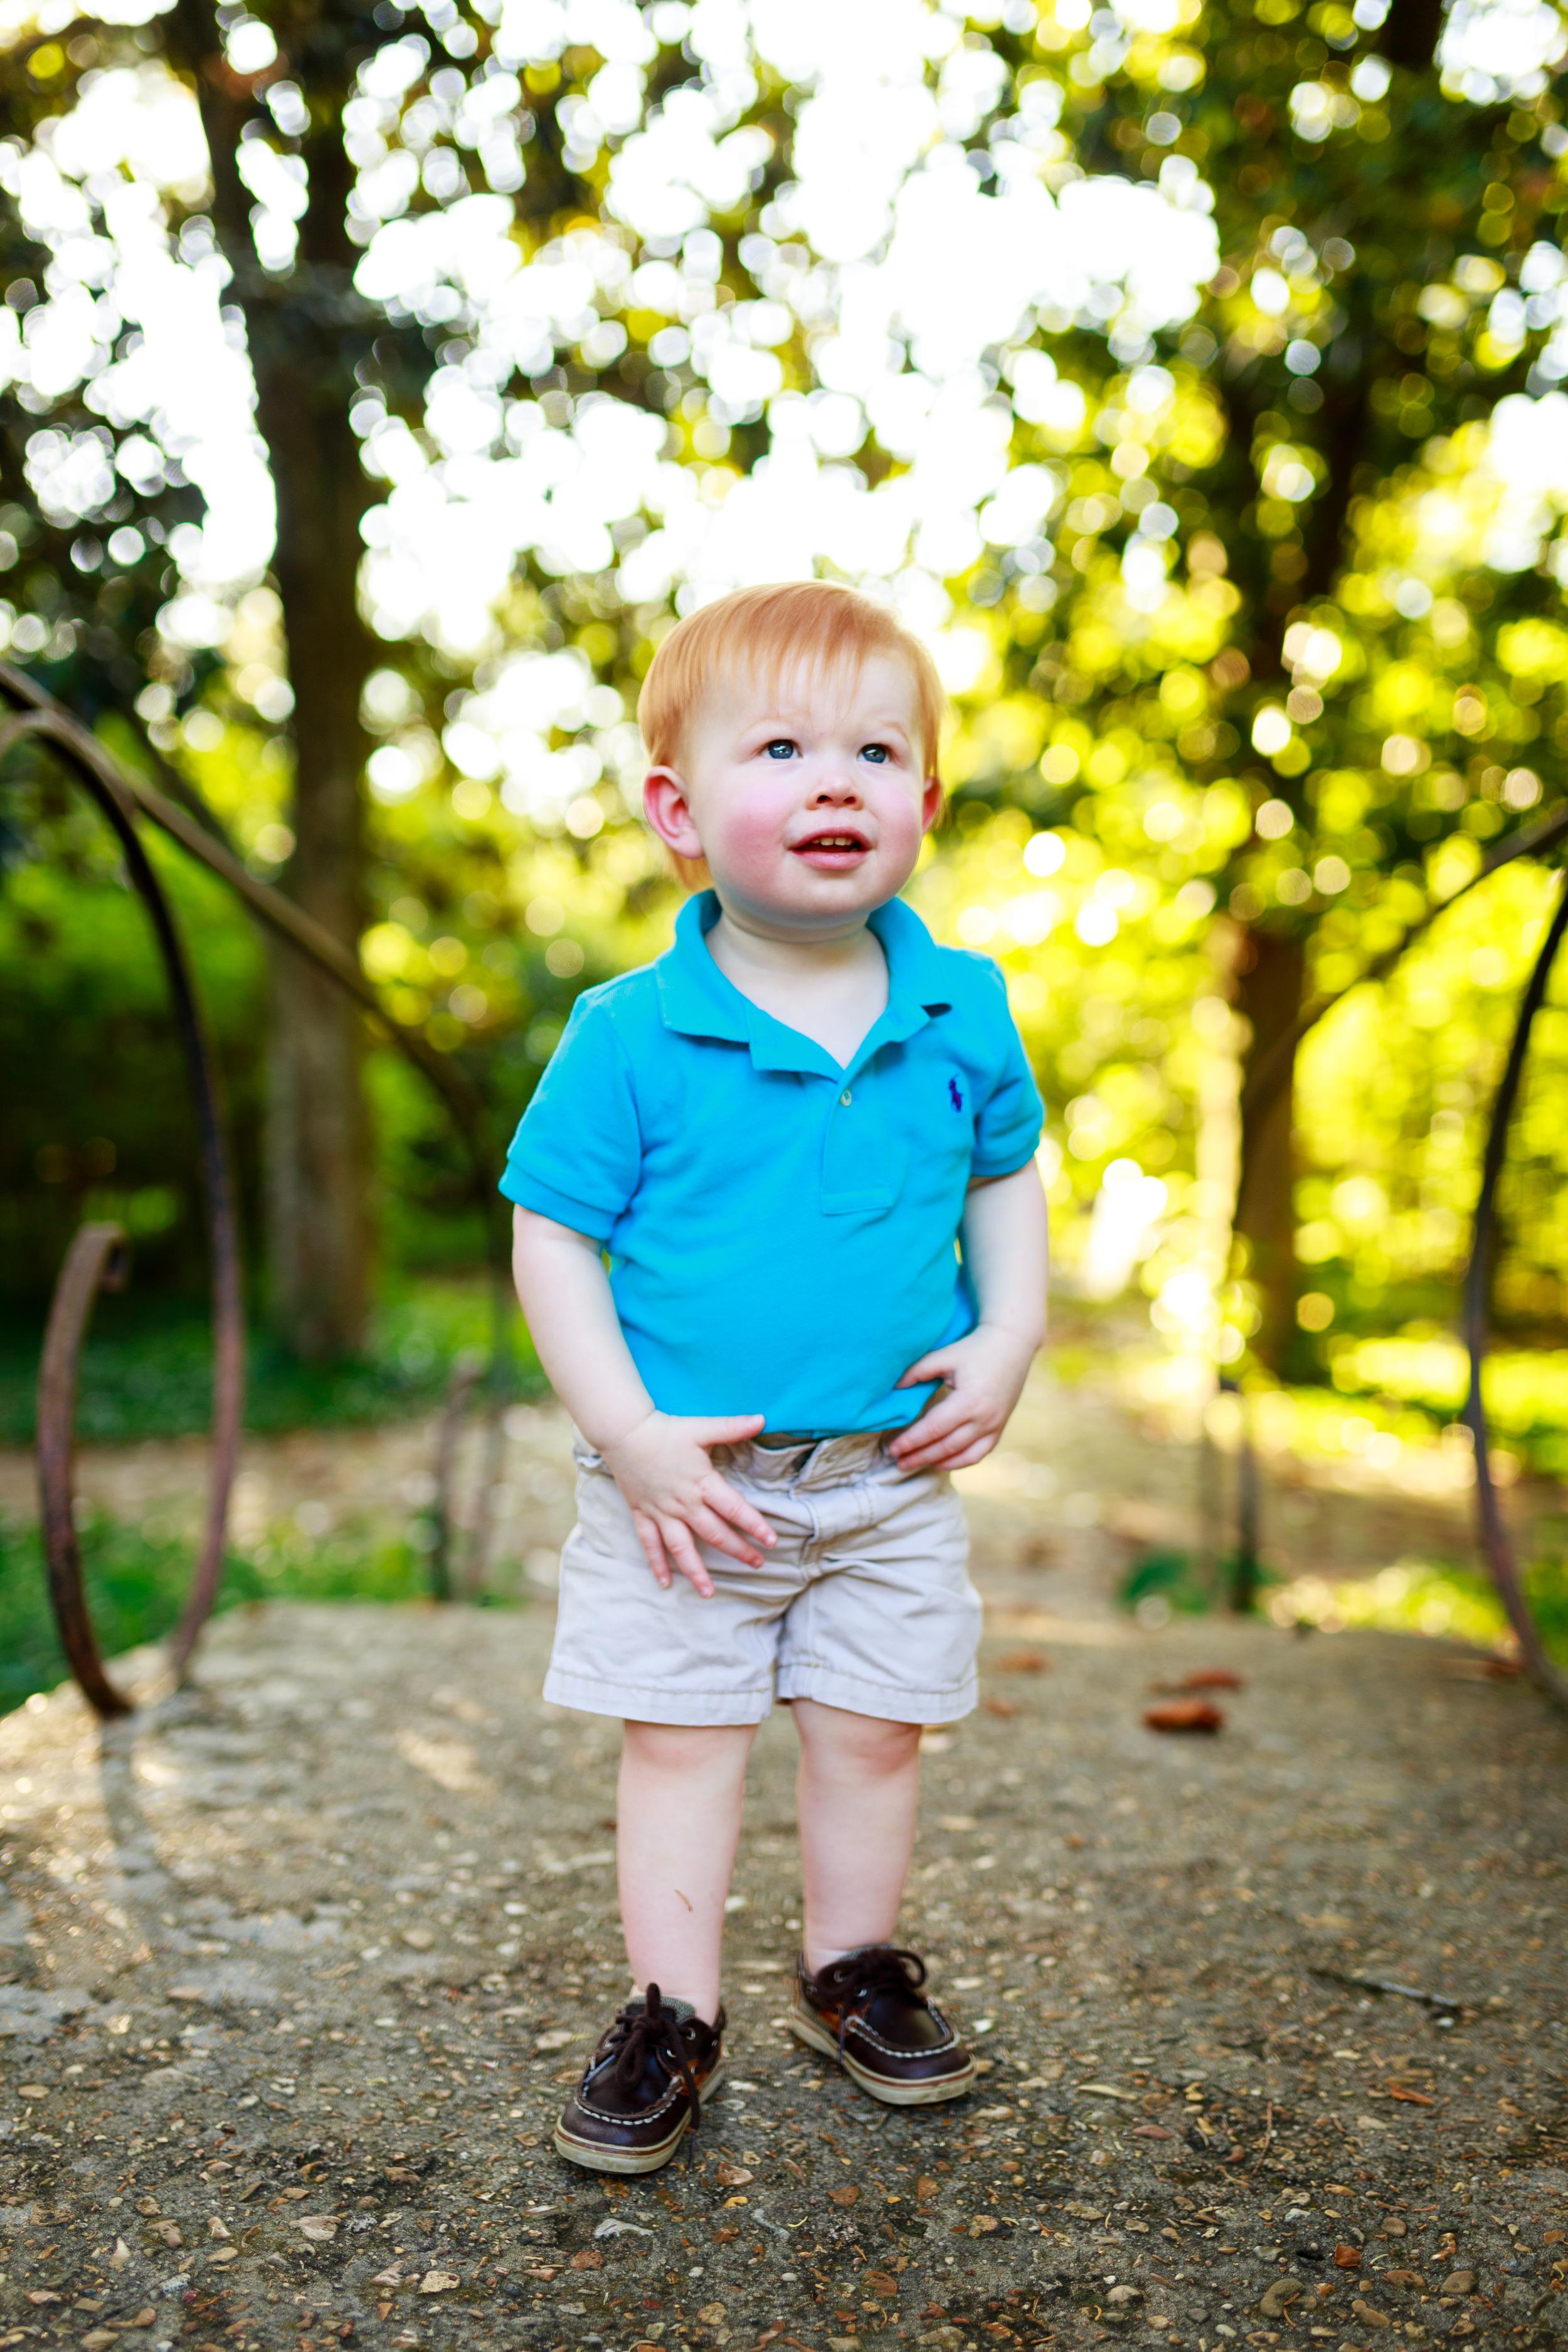 Family-child-portrait-lafayette-broussard-youngsville-photographer-7.jpg